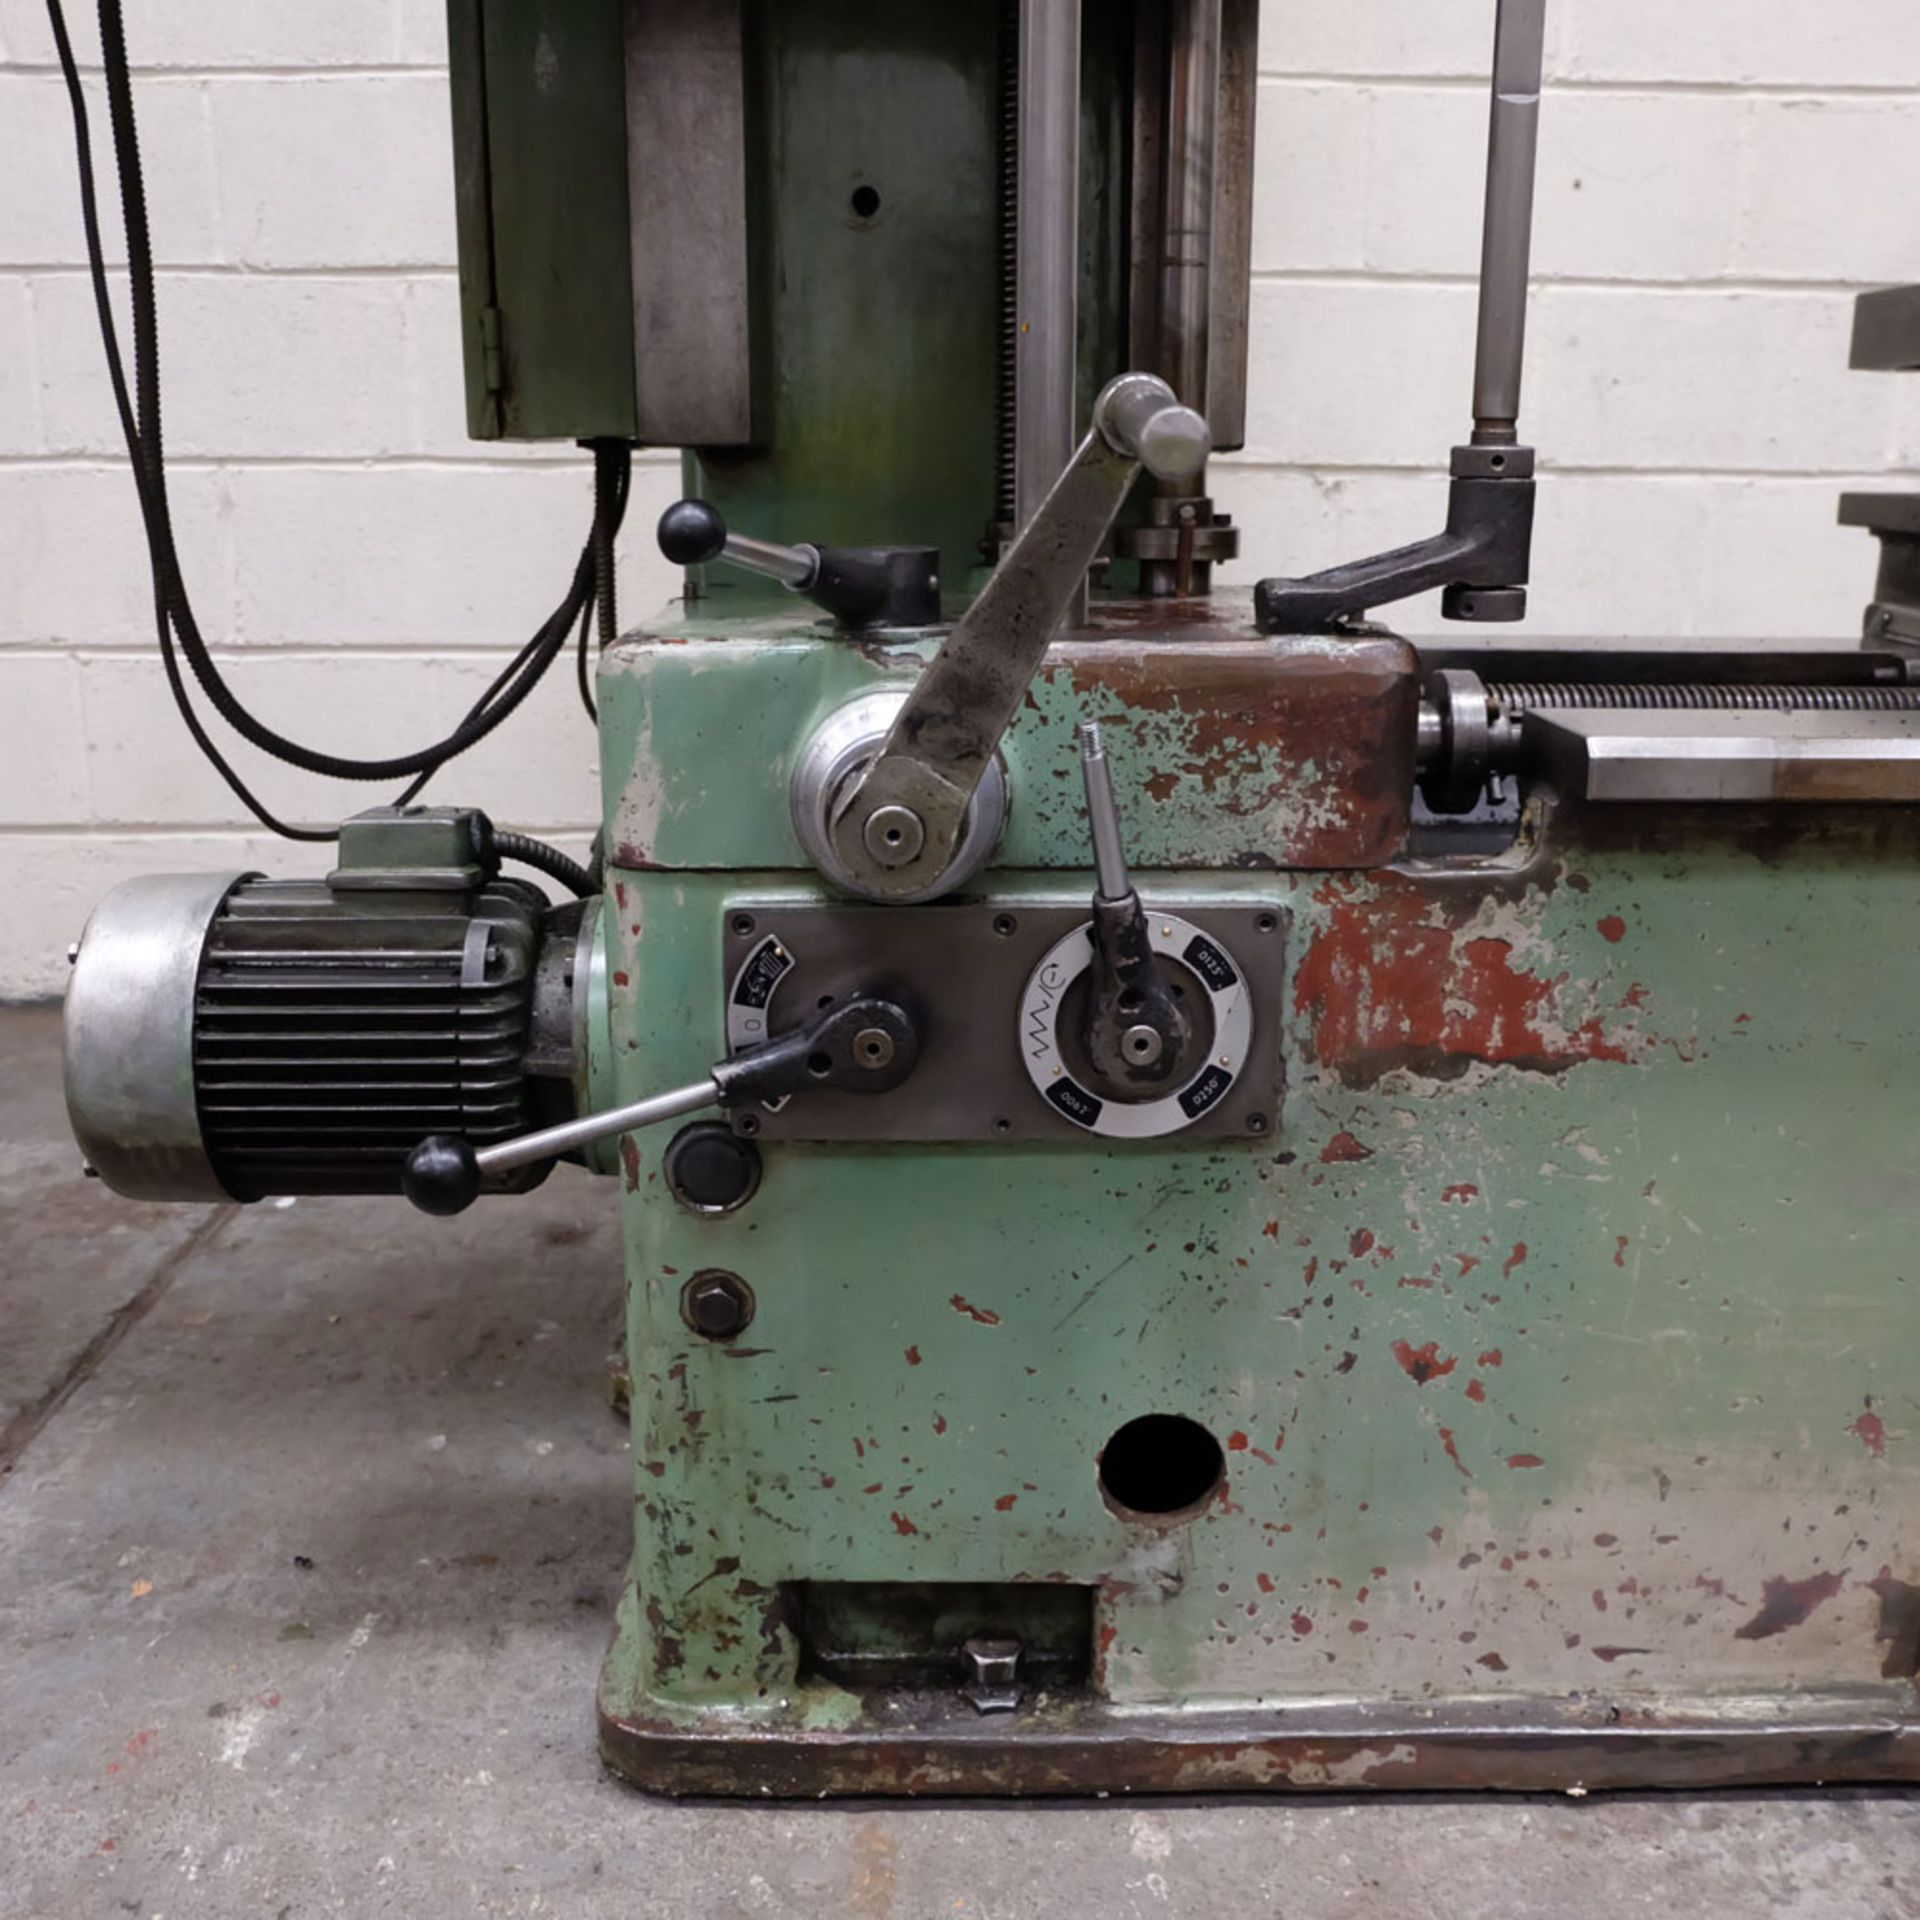 Juaristi Model MDR-55 Horizontal Boring Machine. Spindle Size: 55mm Dia. Spindle Bore: No.4 MT. - Image 8 of 14